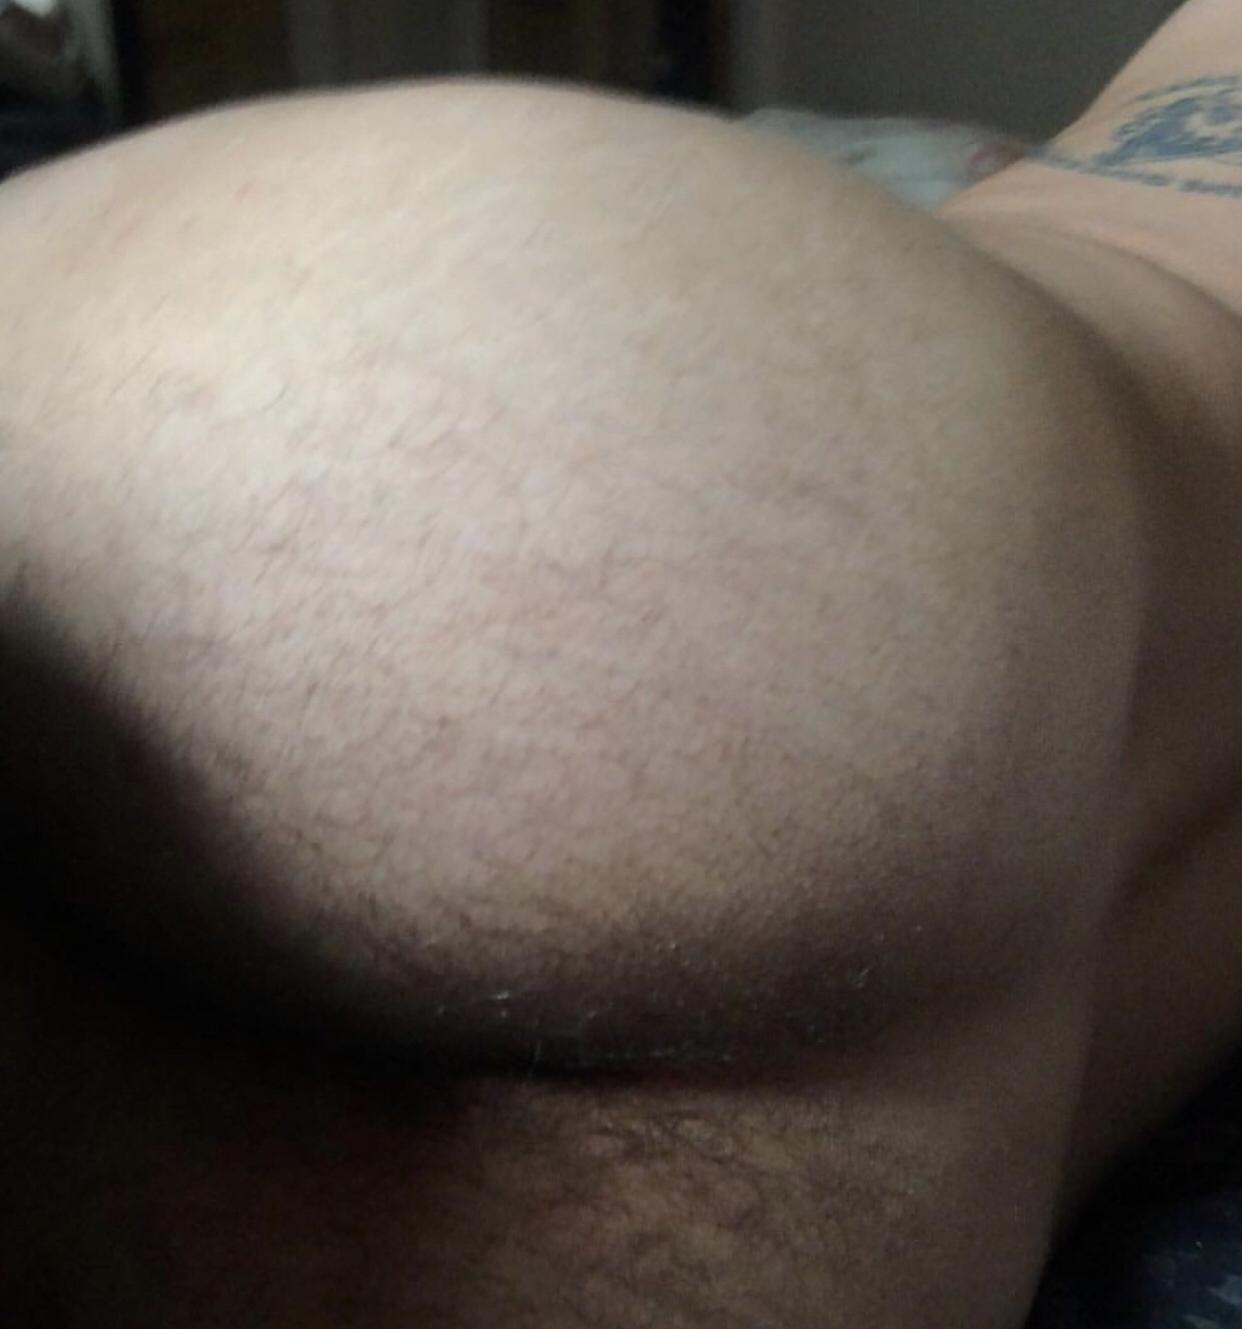 Jake Cannavale's Butt